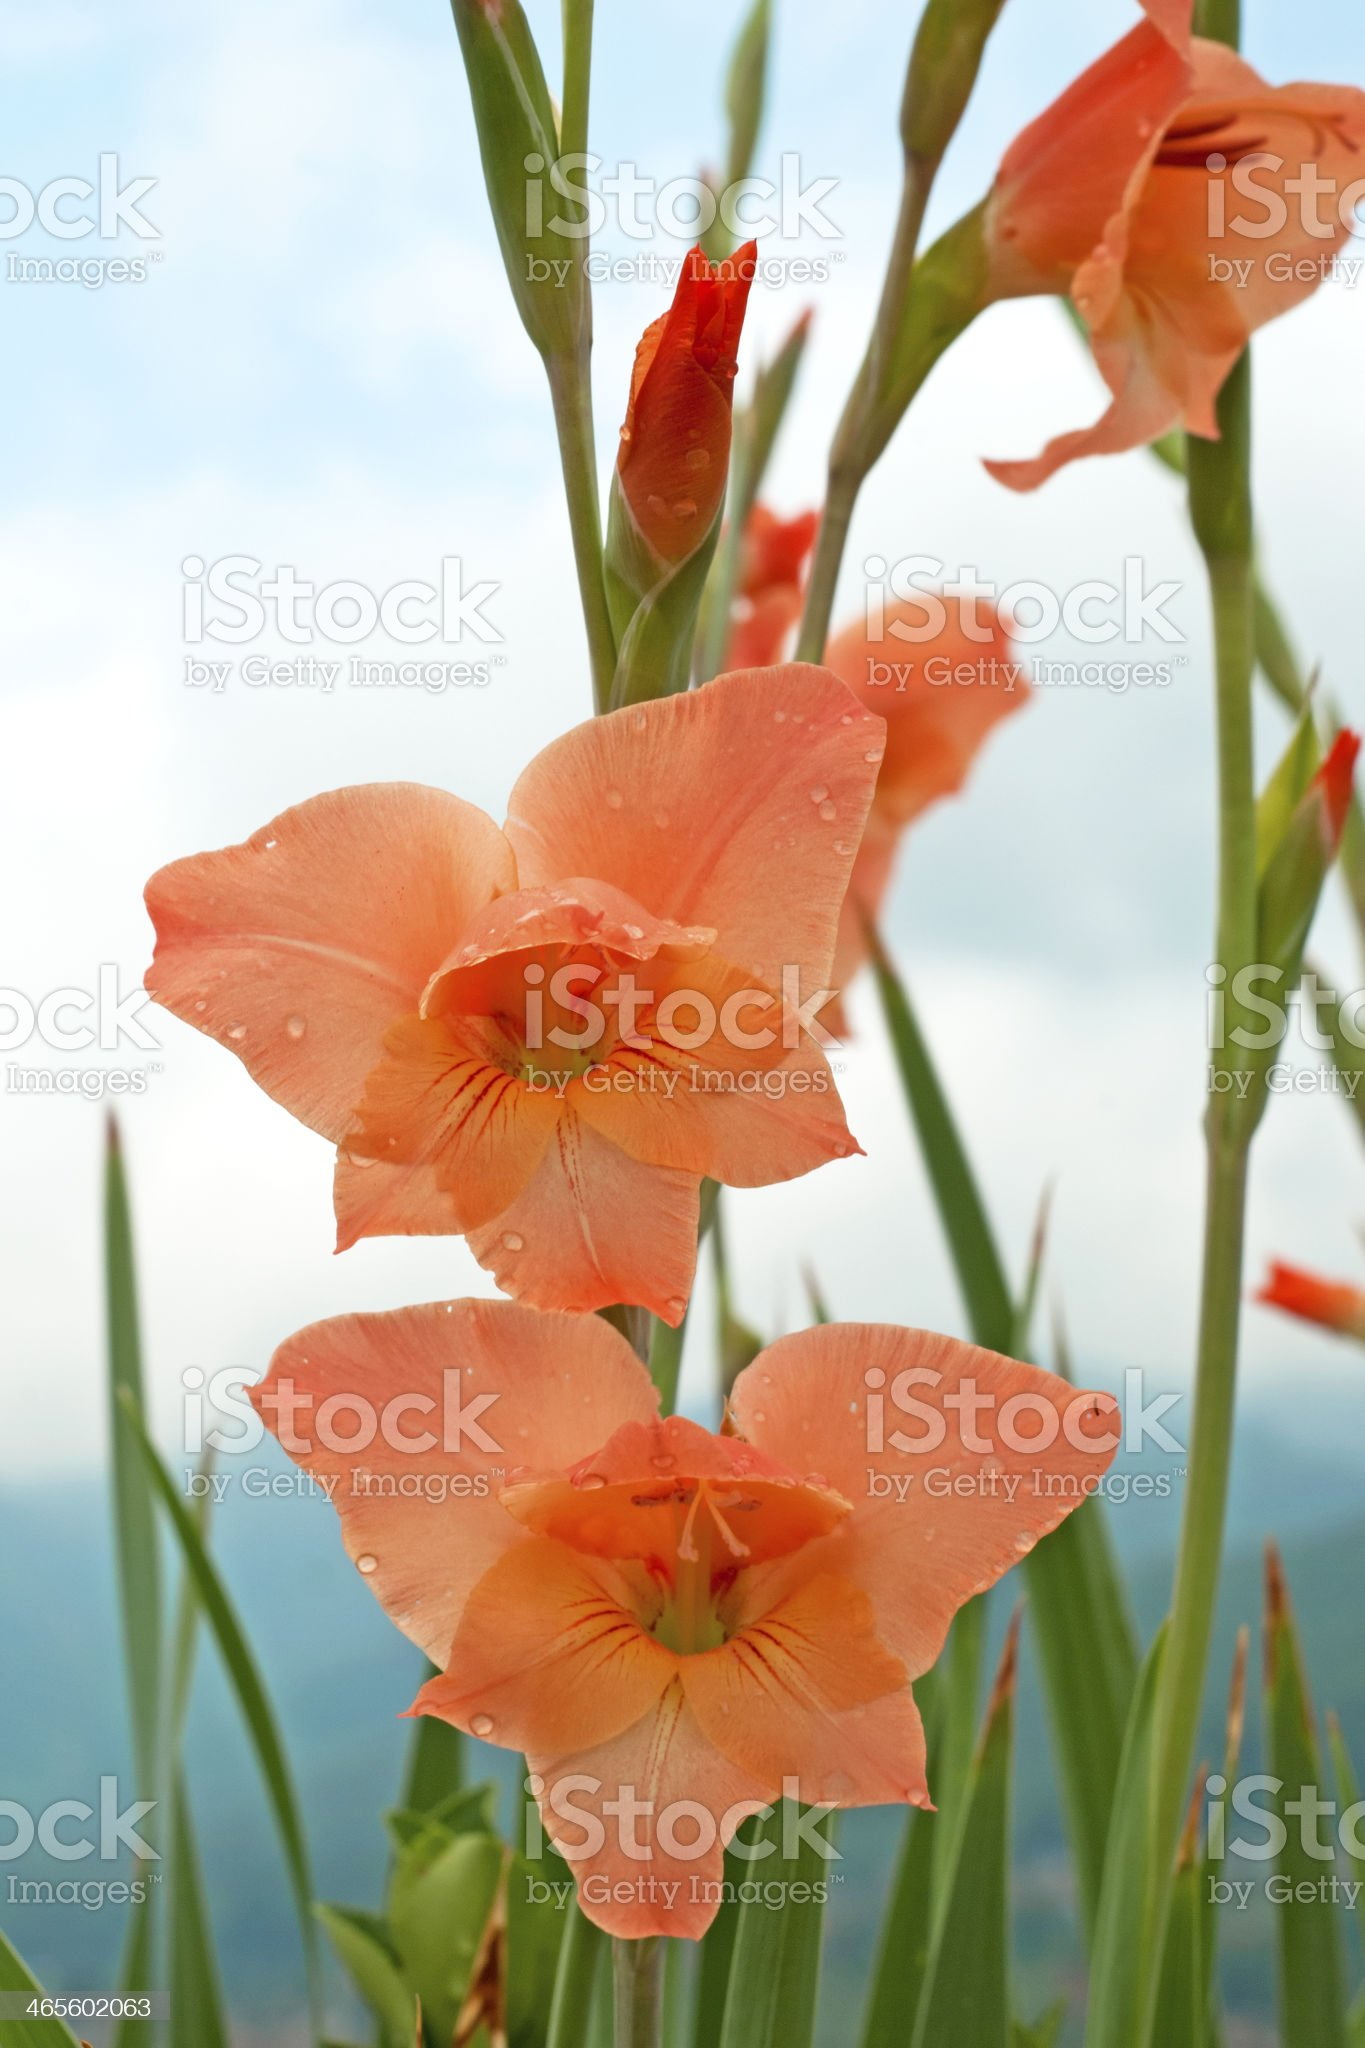 Gladiolus Flower Close-up royalty-free stock photo